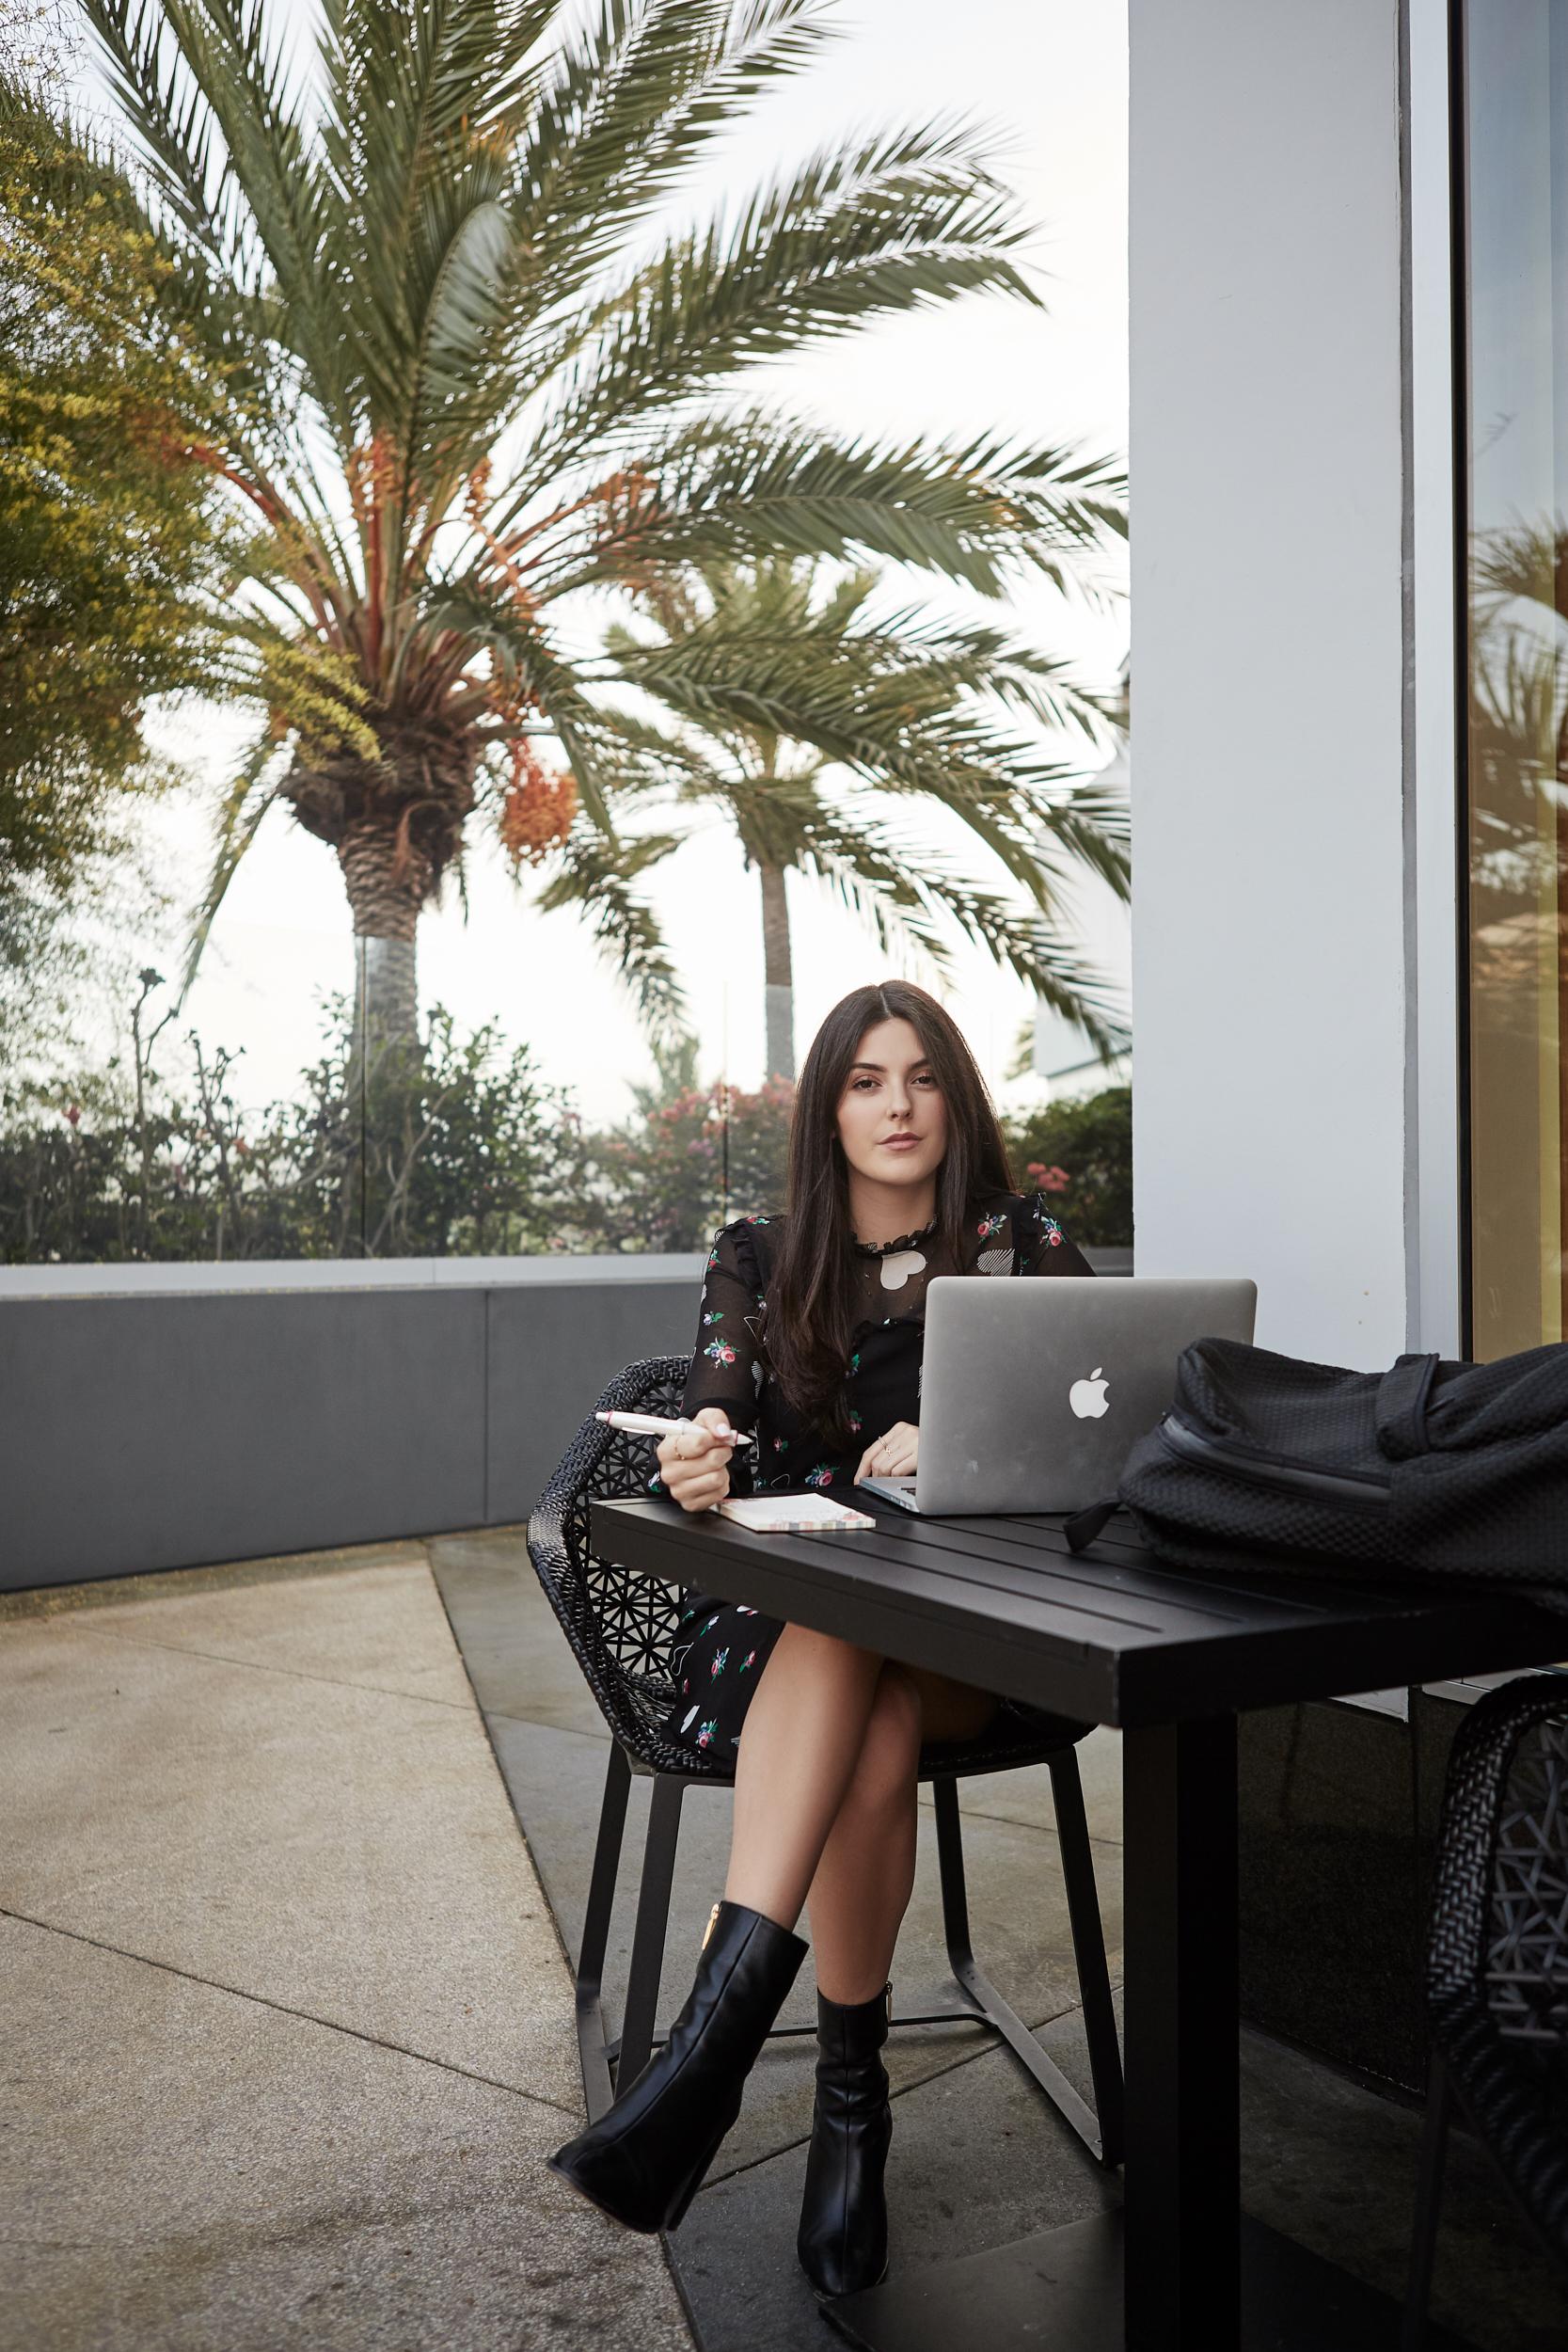 Julia Friedman 5 ways to avoid feeling overwhelmed